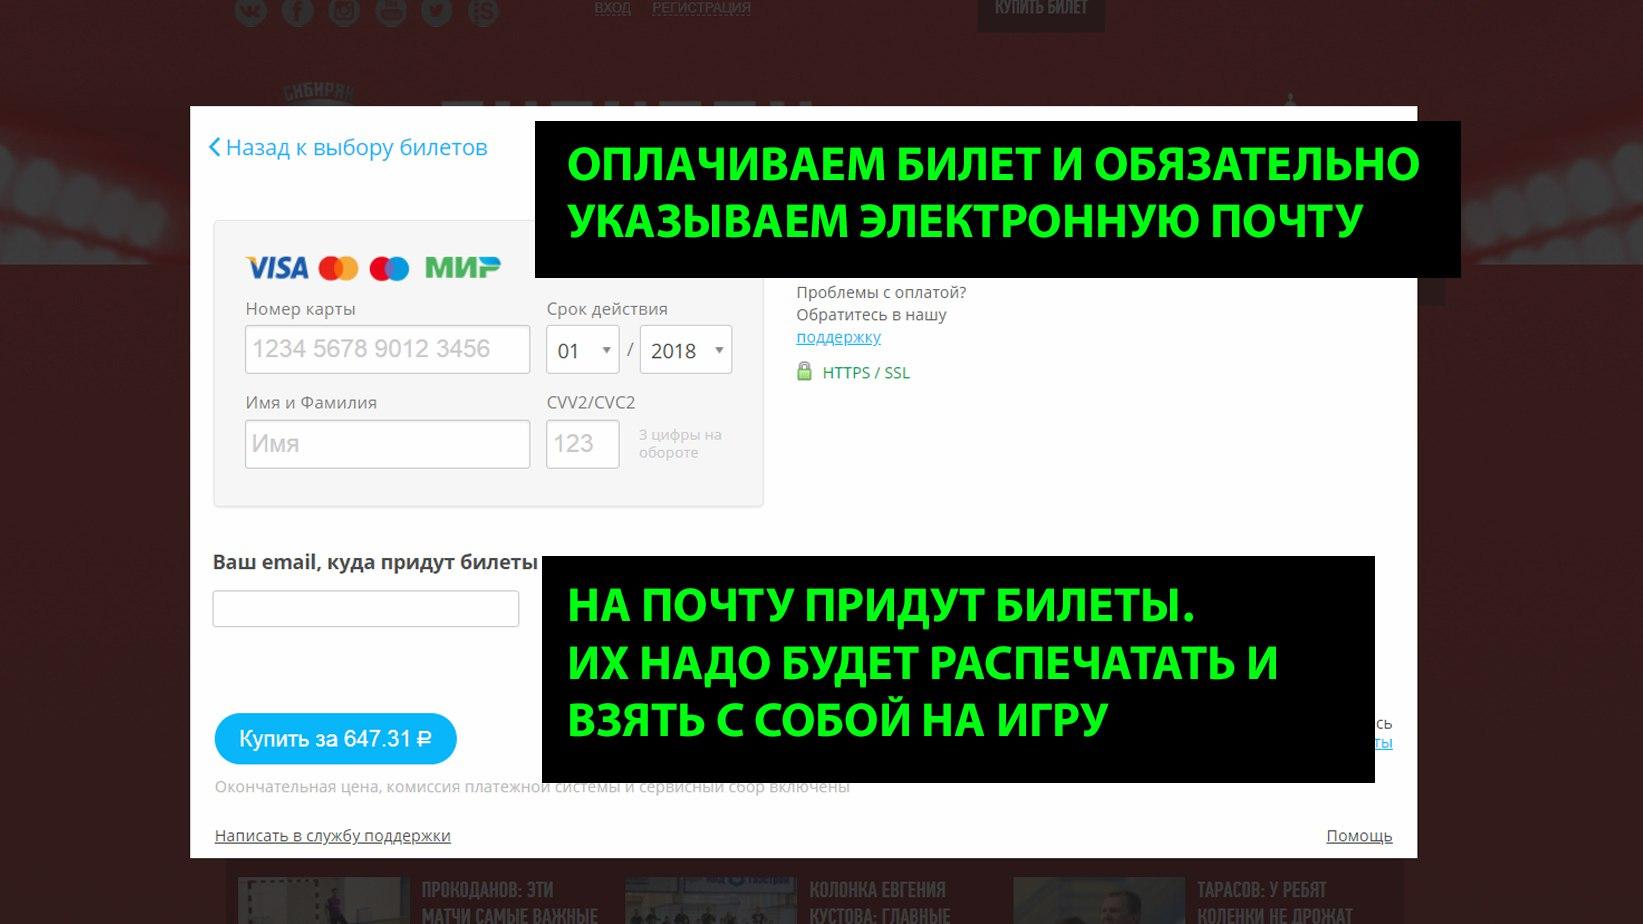 https://pp.userapi.com/c824200/v824200801/e0e1e/ut3F7c_m2vM.jpg